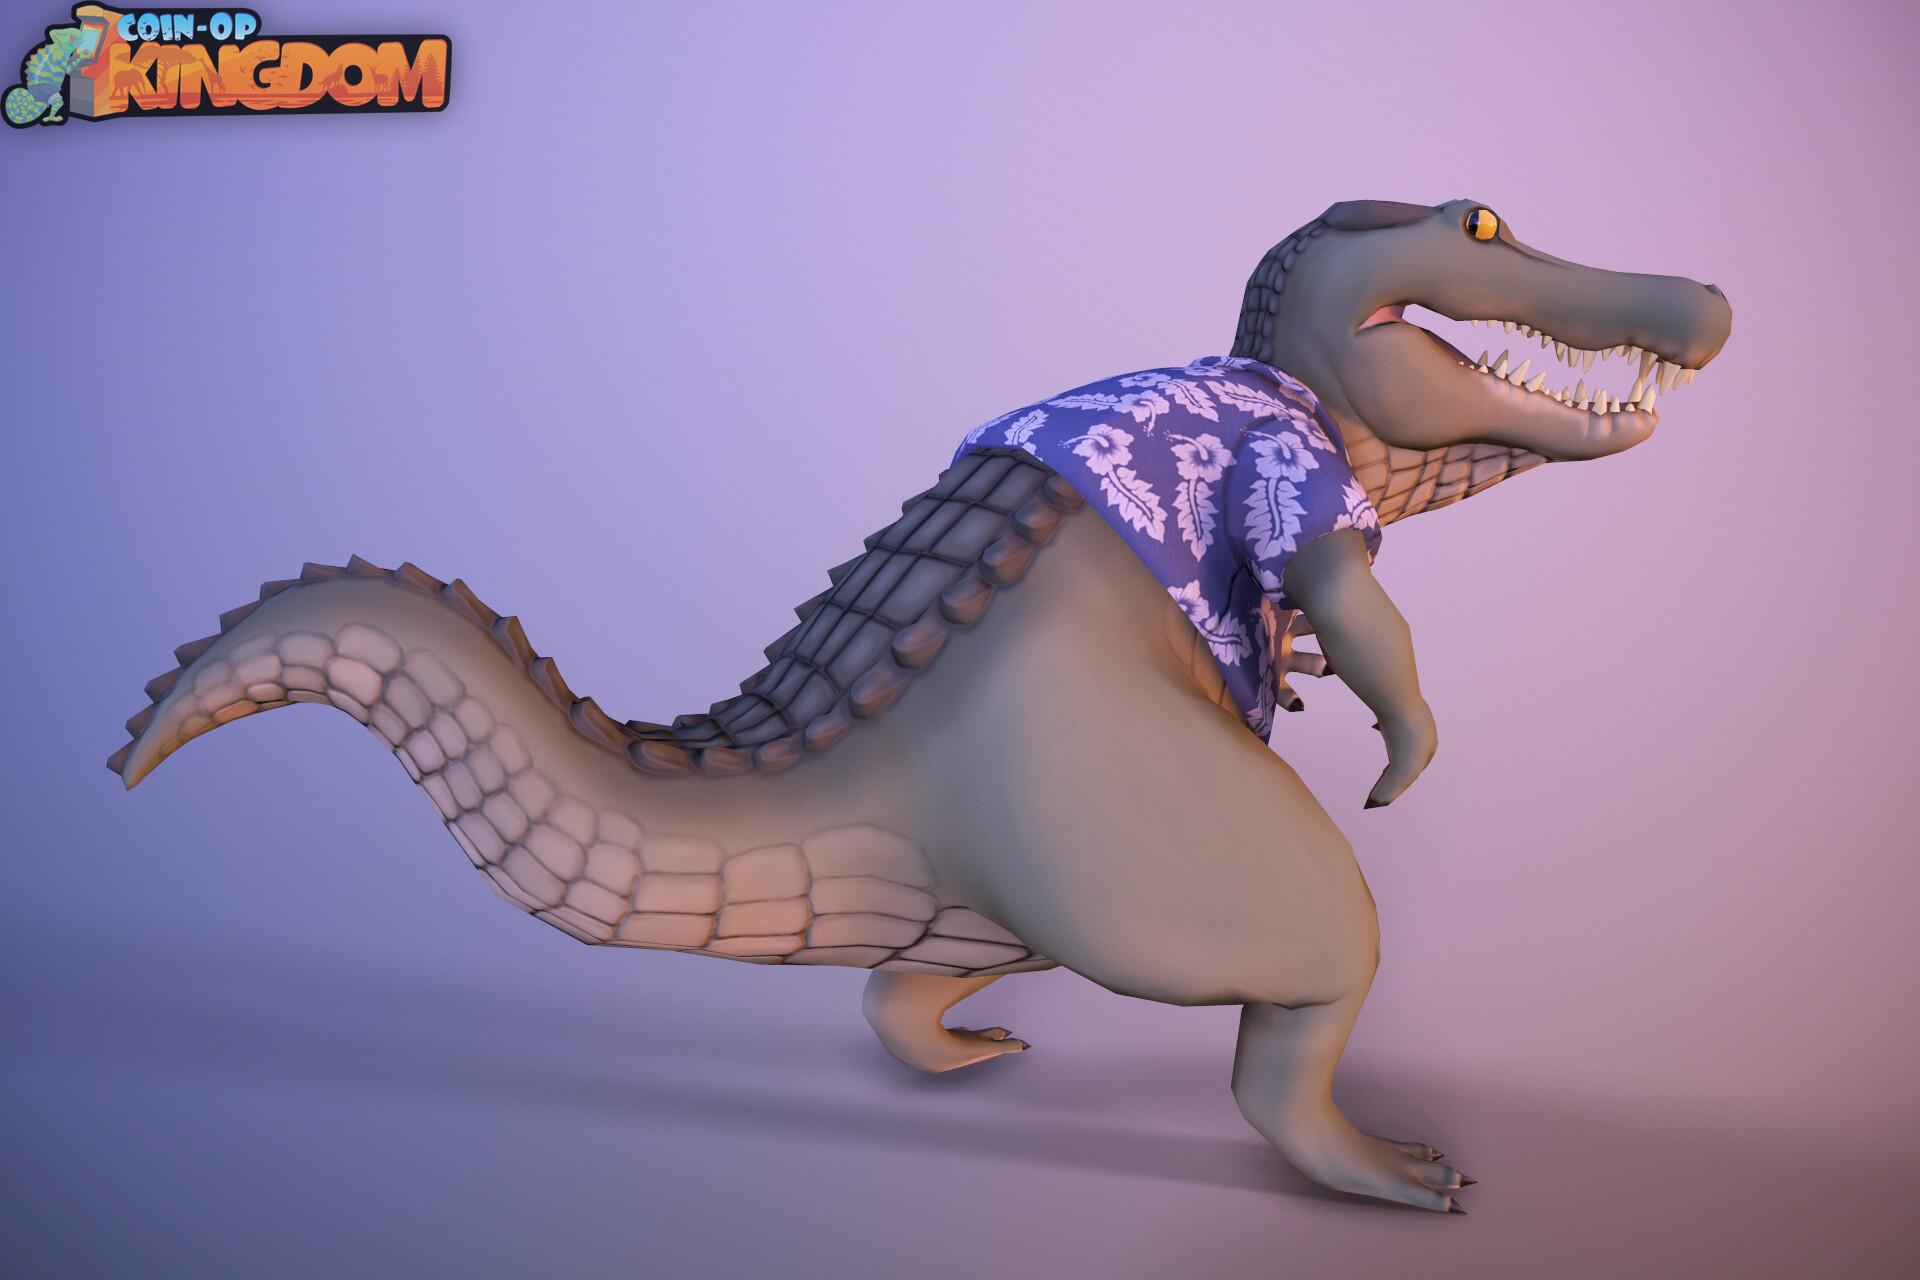 Chloe mccann croc